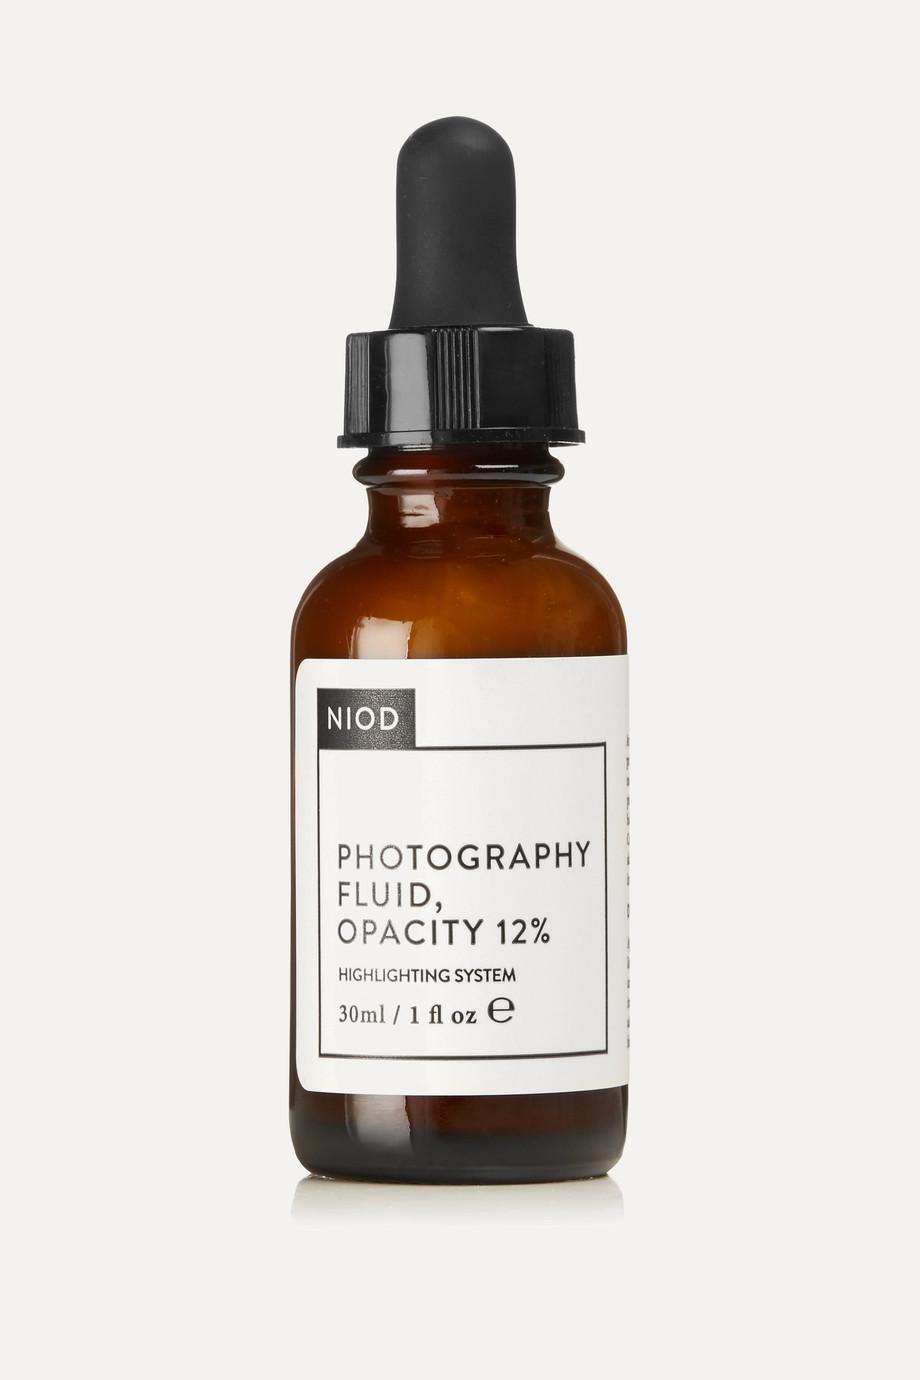 NIOD Photography Fluid, Opacity 12 %, 30 ml – Serum